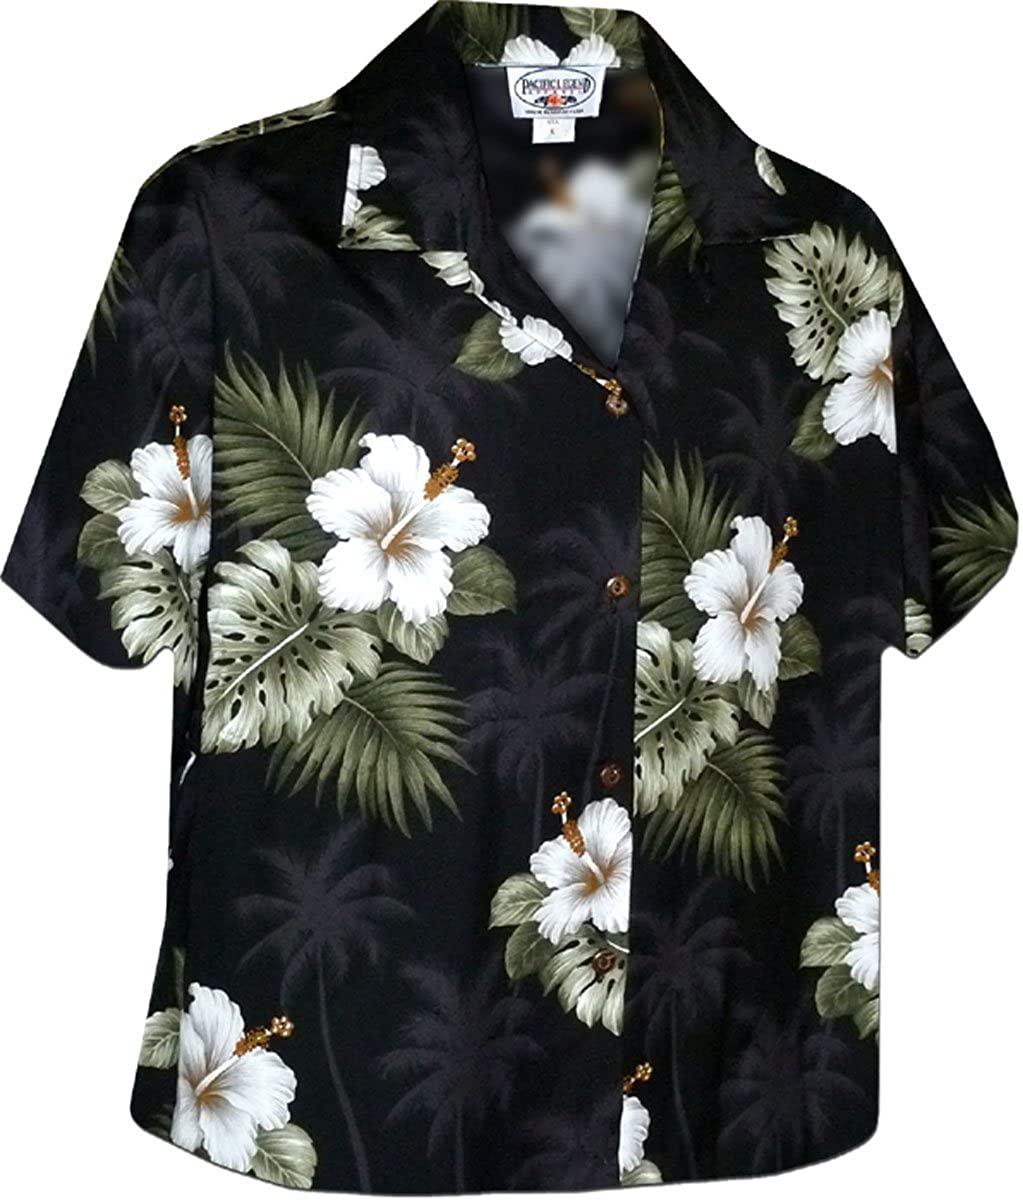 Hibiscus Islands Women's Aloha Shirts Black